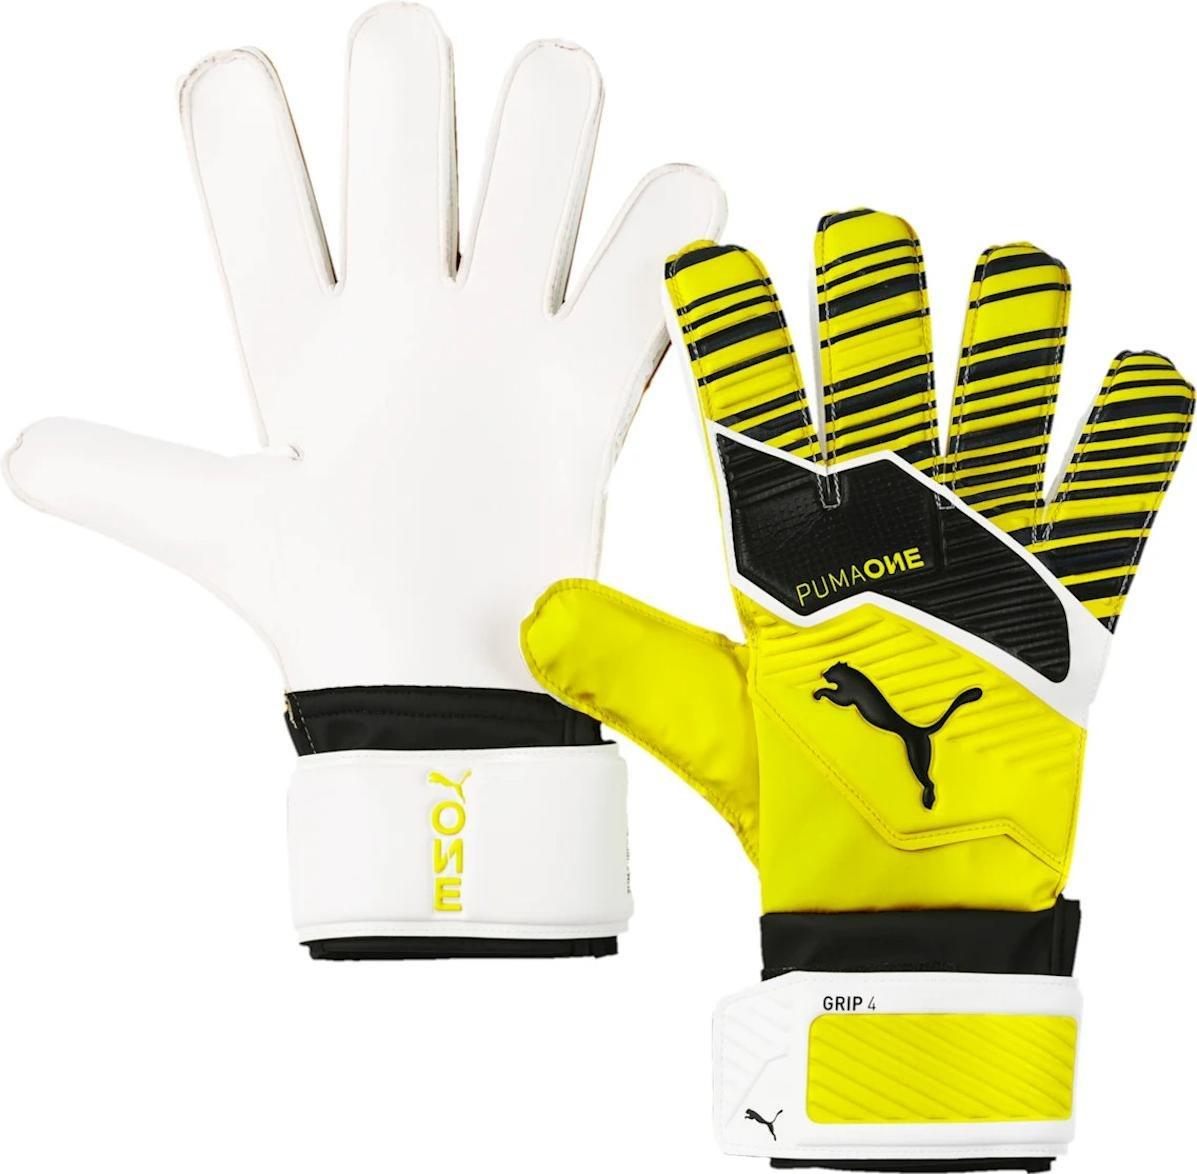 Brankářské rukavice Puma One Grip 4 041631-05 Velikost 10